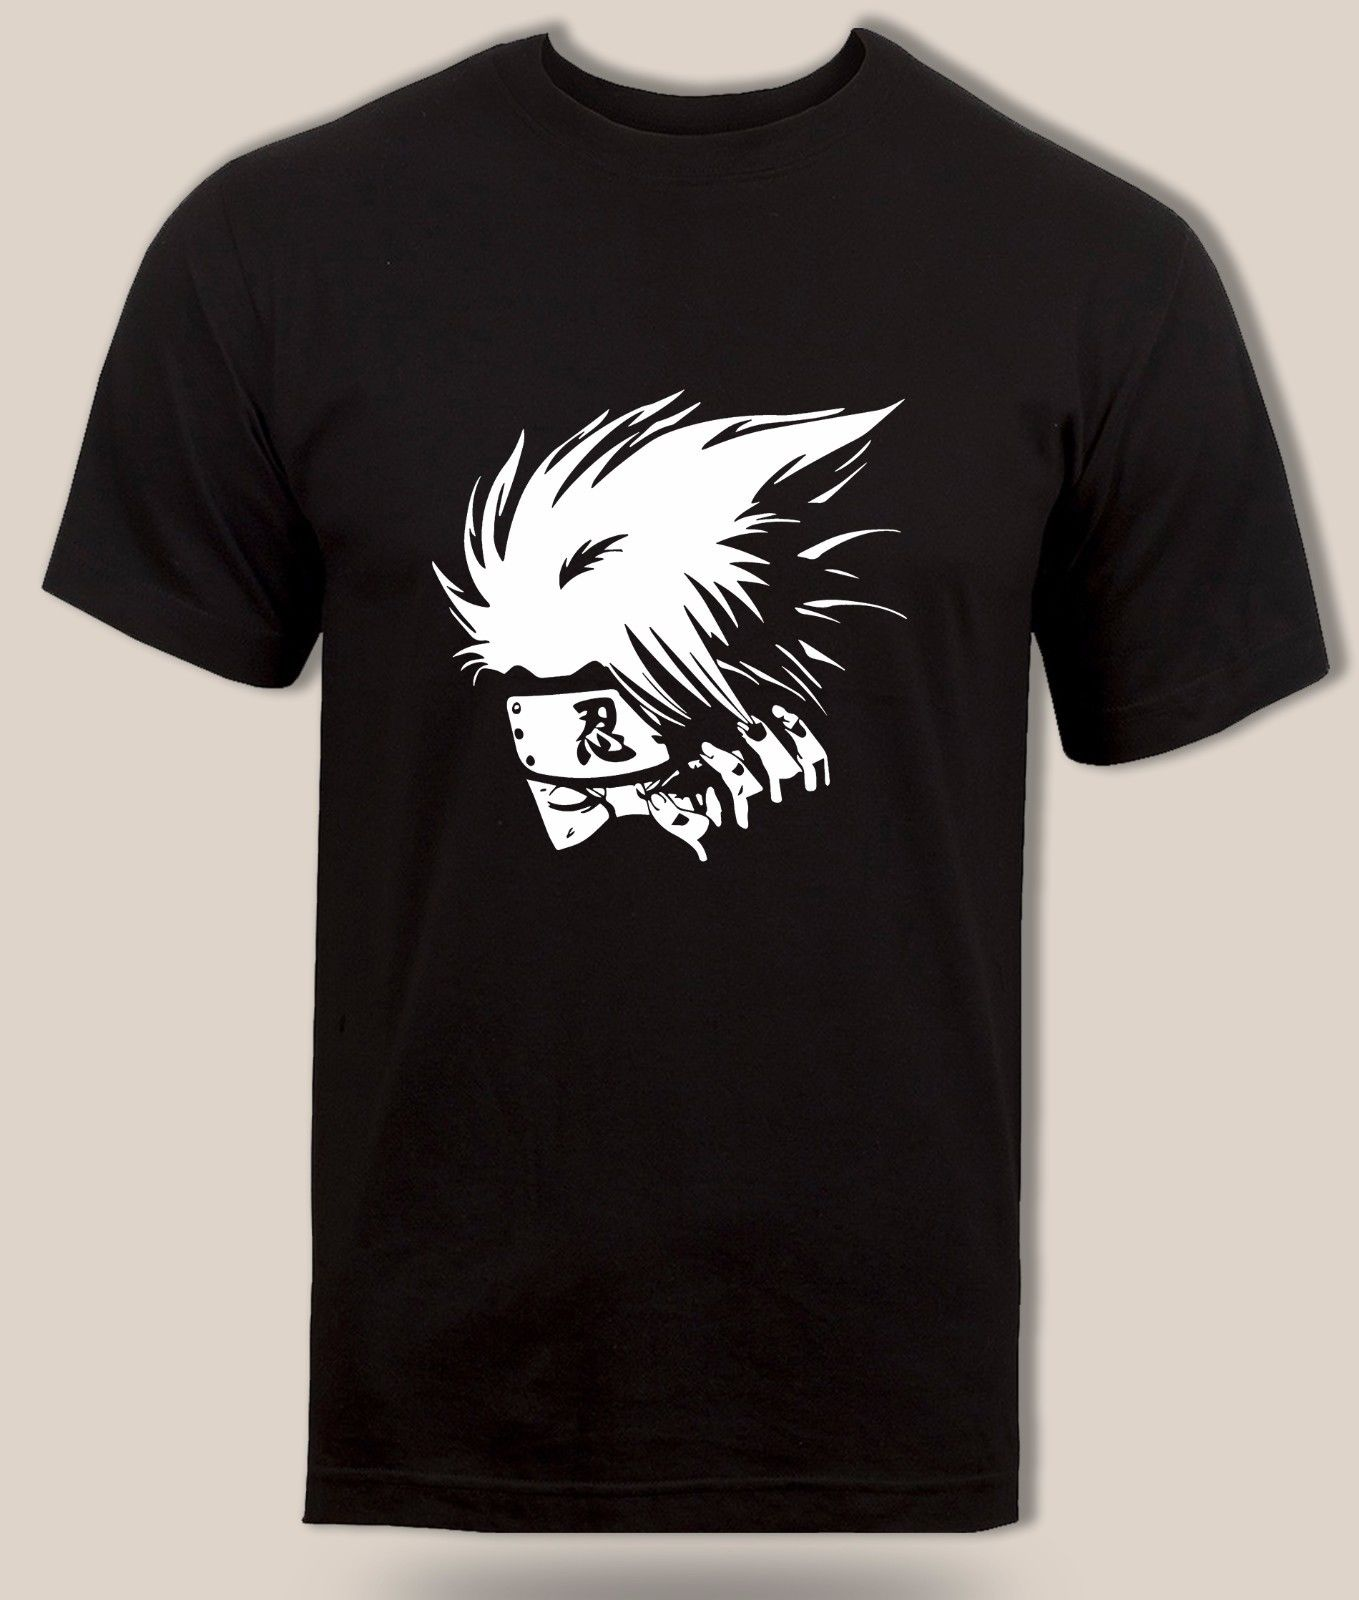 Kakashi hatake sharingan camiseta copia ninja Naruto shinnobi novedad anime envío gratis Harajuku Tops de moda clásicos único